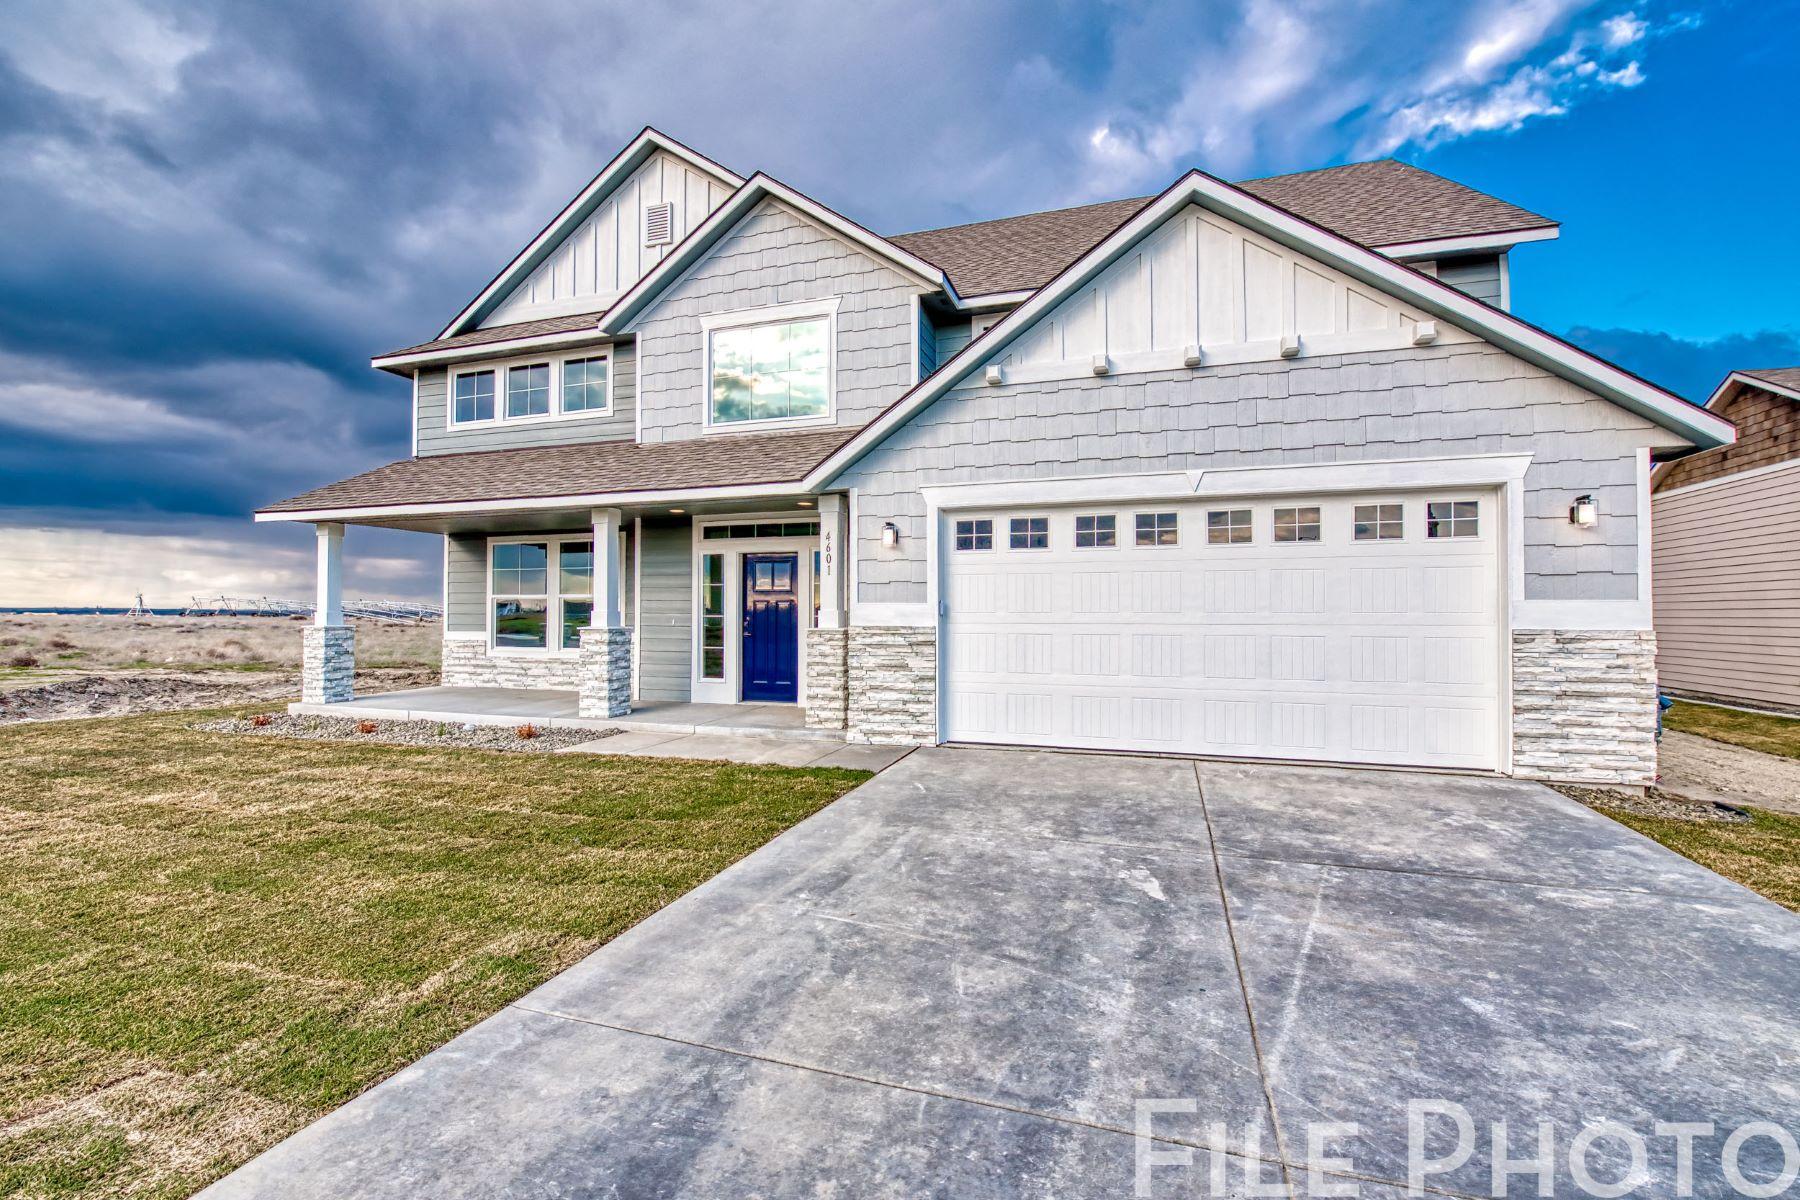 Single Family Homes for Sale at Viking Builders Retreat Floor Plan 1769 Sicily Lane Richland, Washington 99352 United States